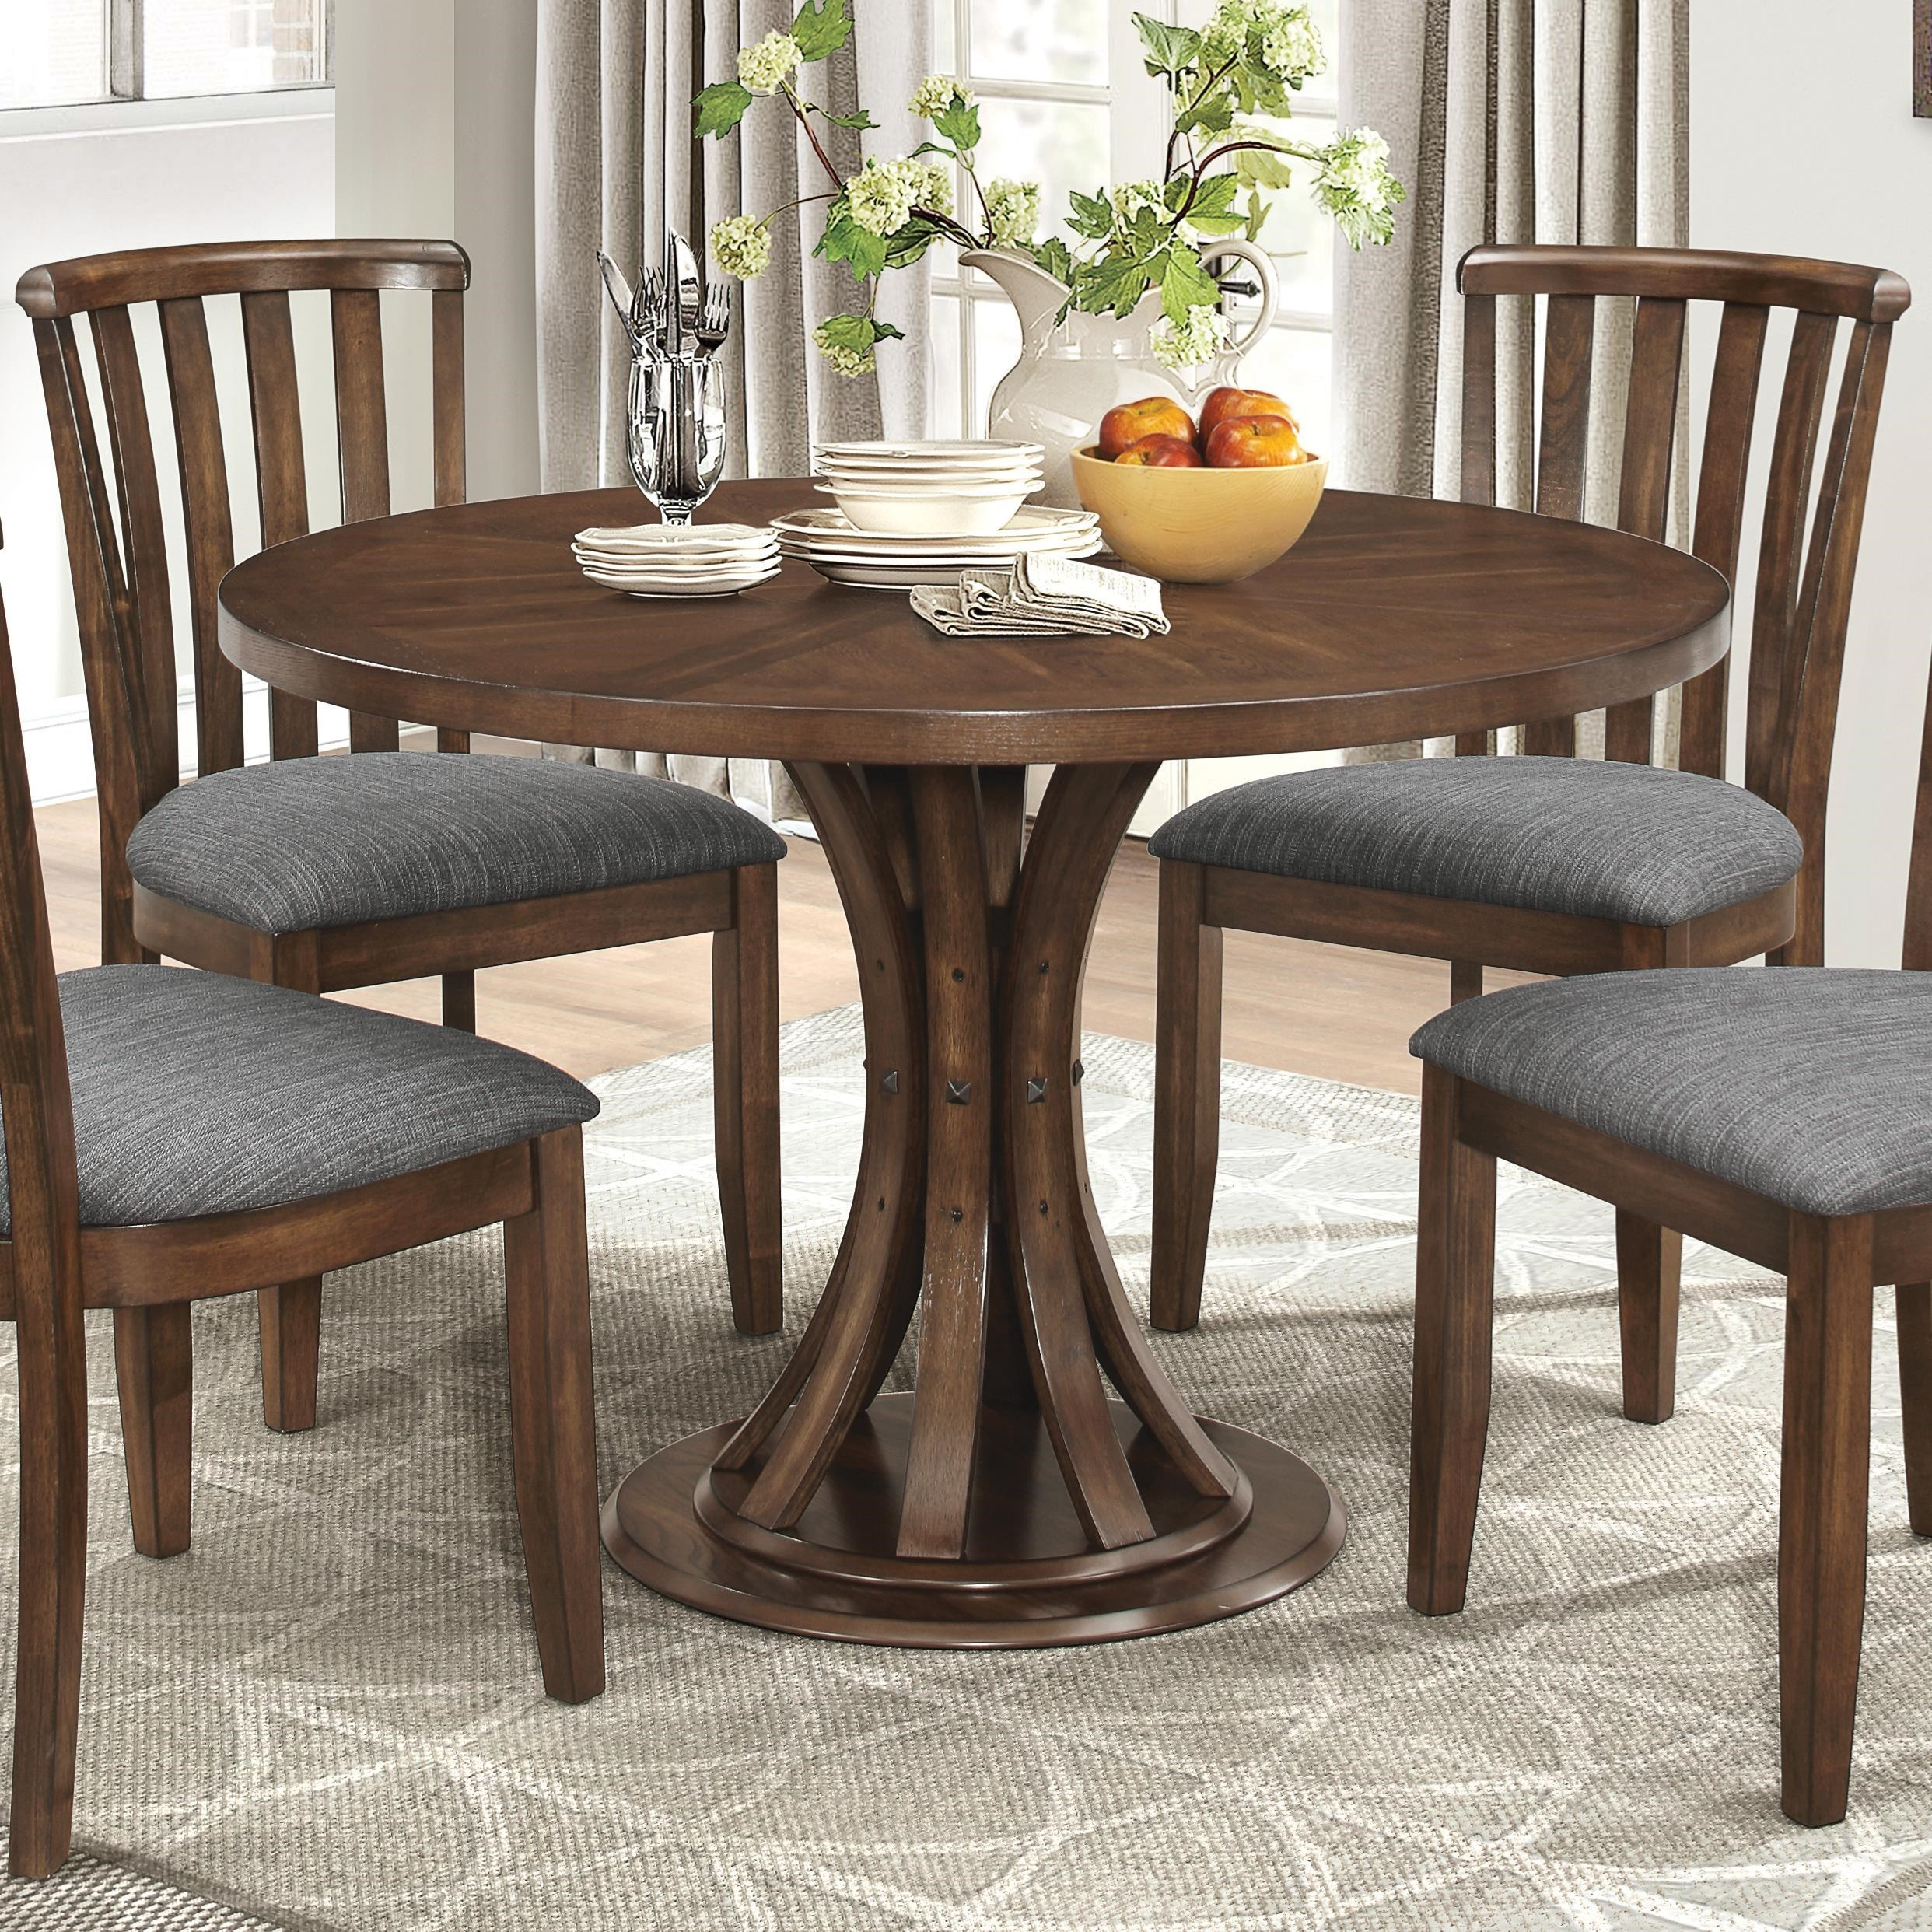 Coaster PrescottDining Table; Coaster PrescottDining Table